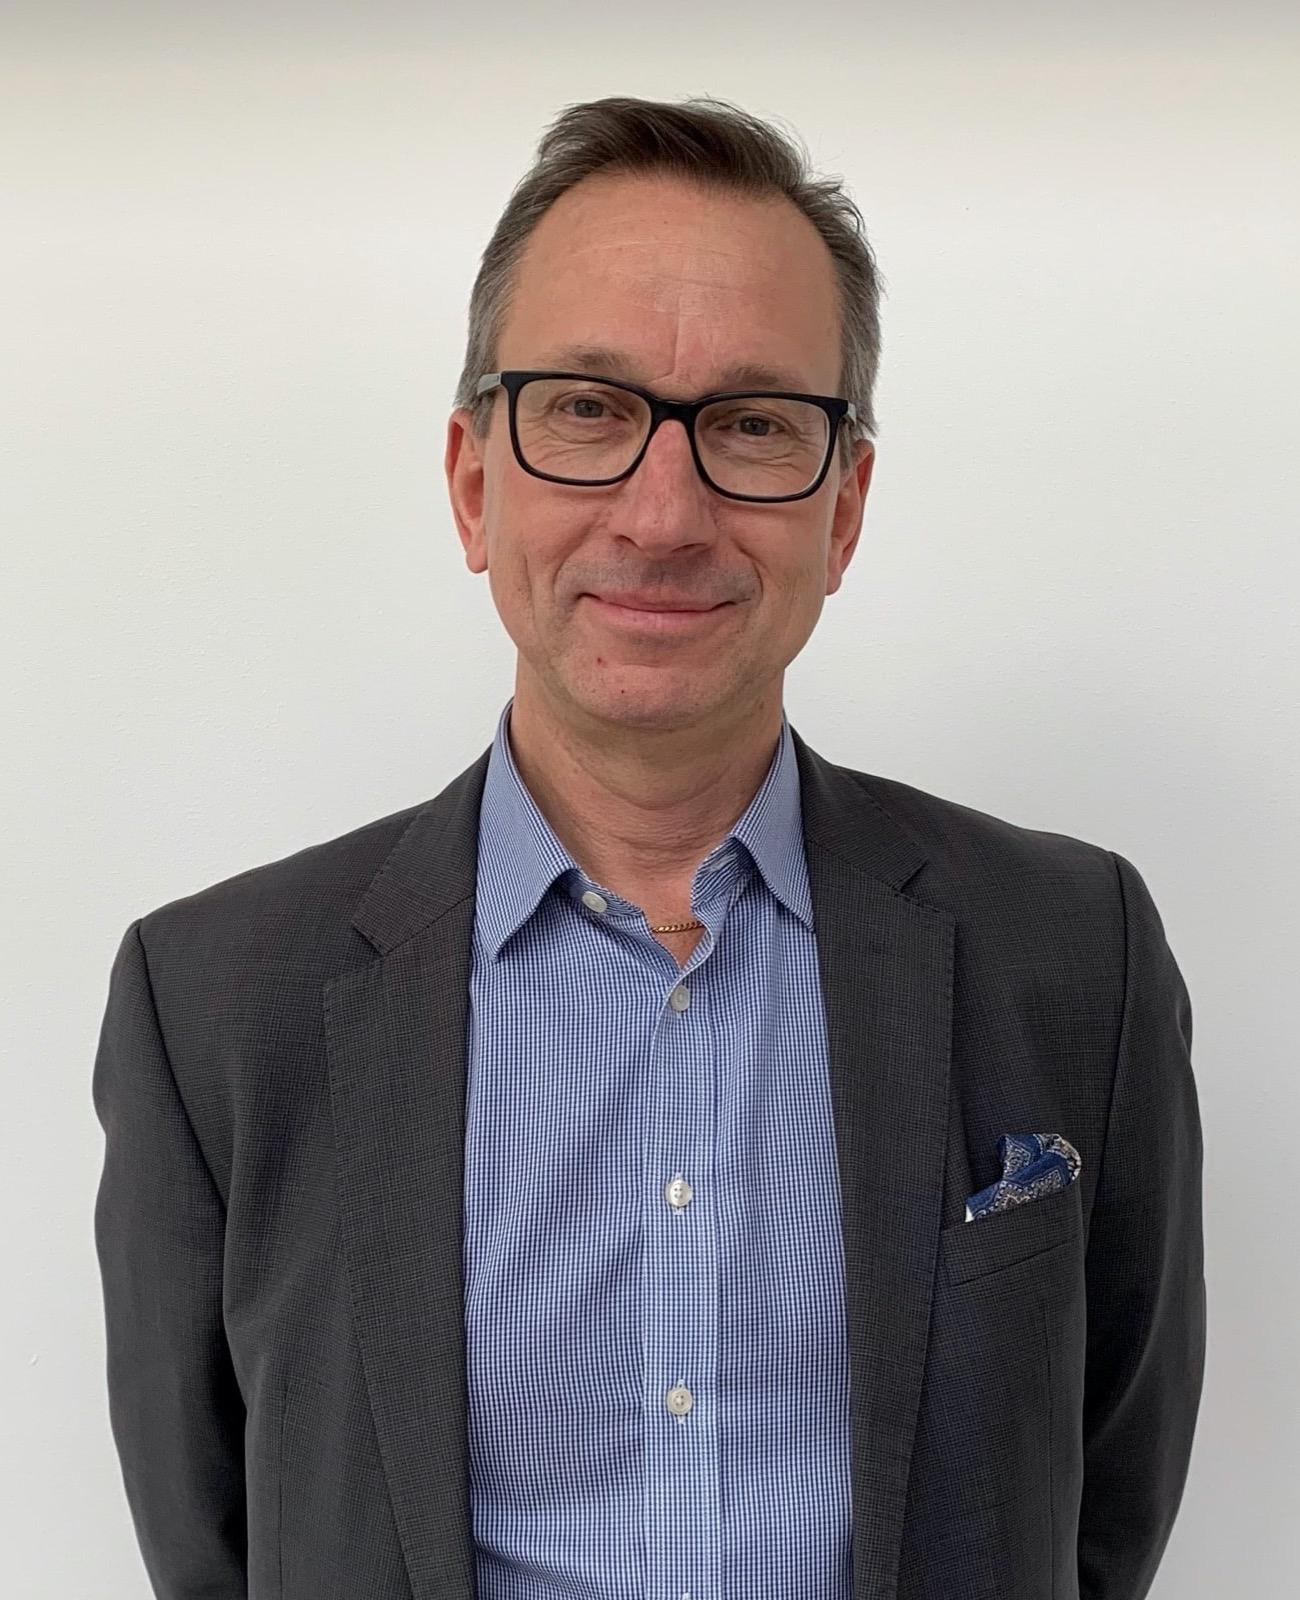 Fredrik Lundberg